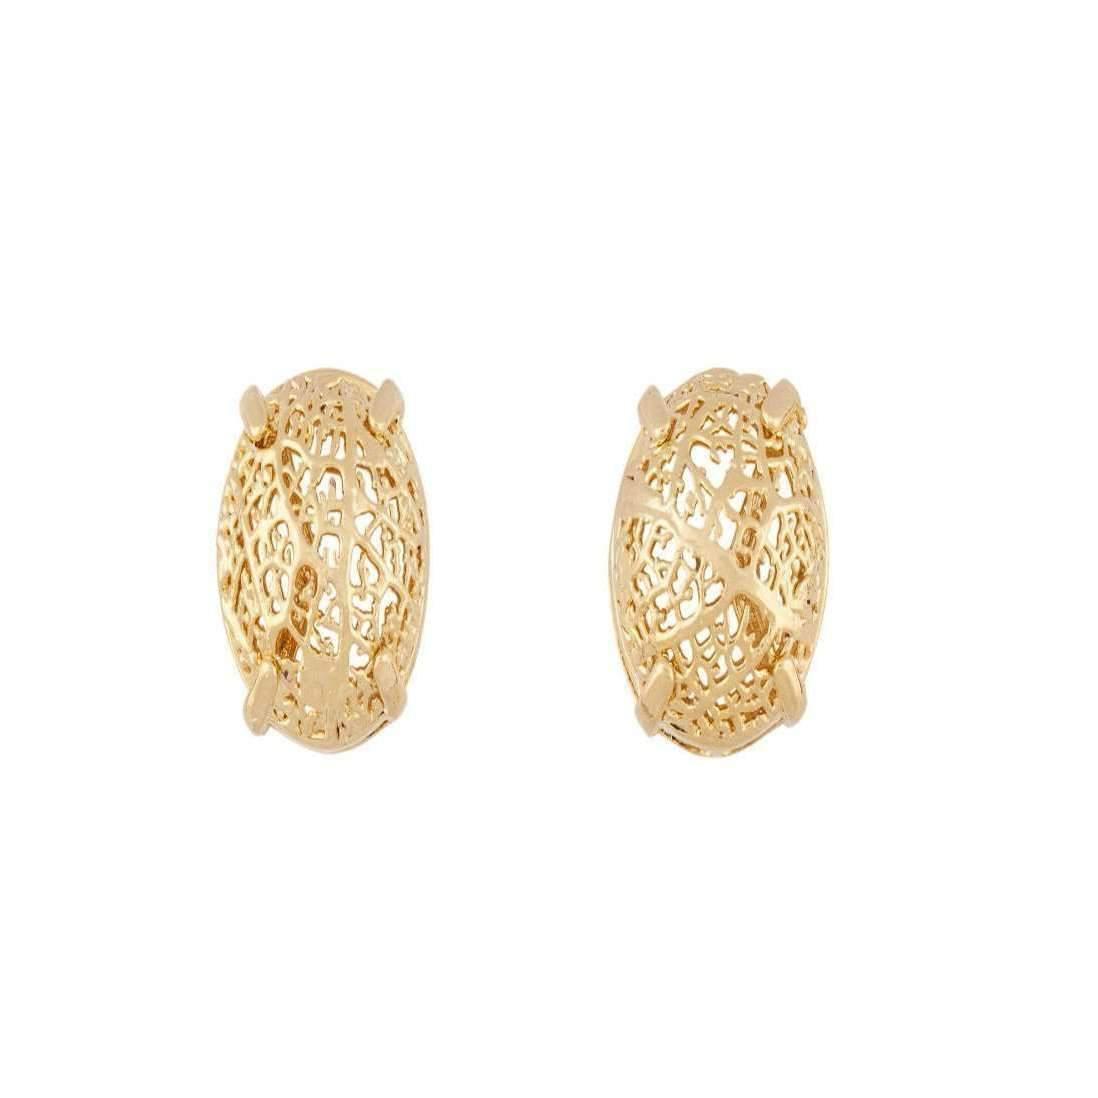 Amazona Secrets 18kt Gold Savannah Box Earring With Claws mJPIOFiVyd